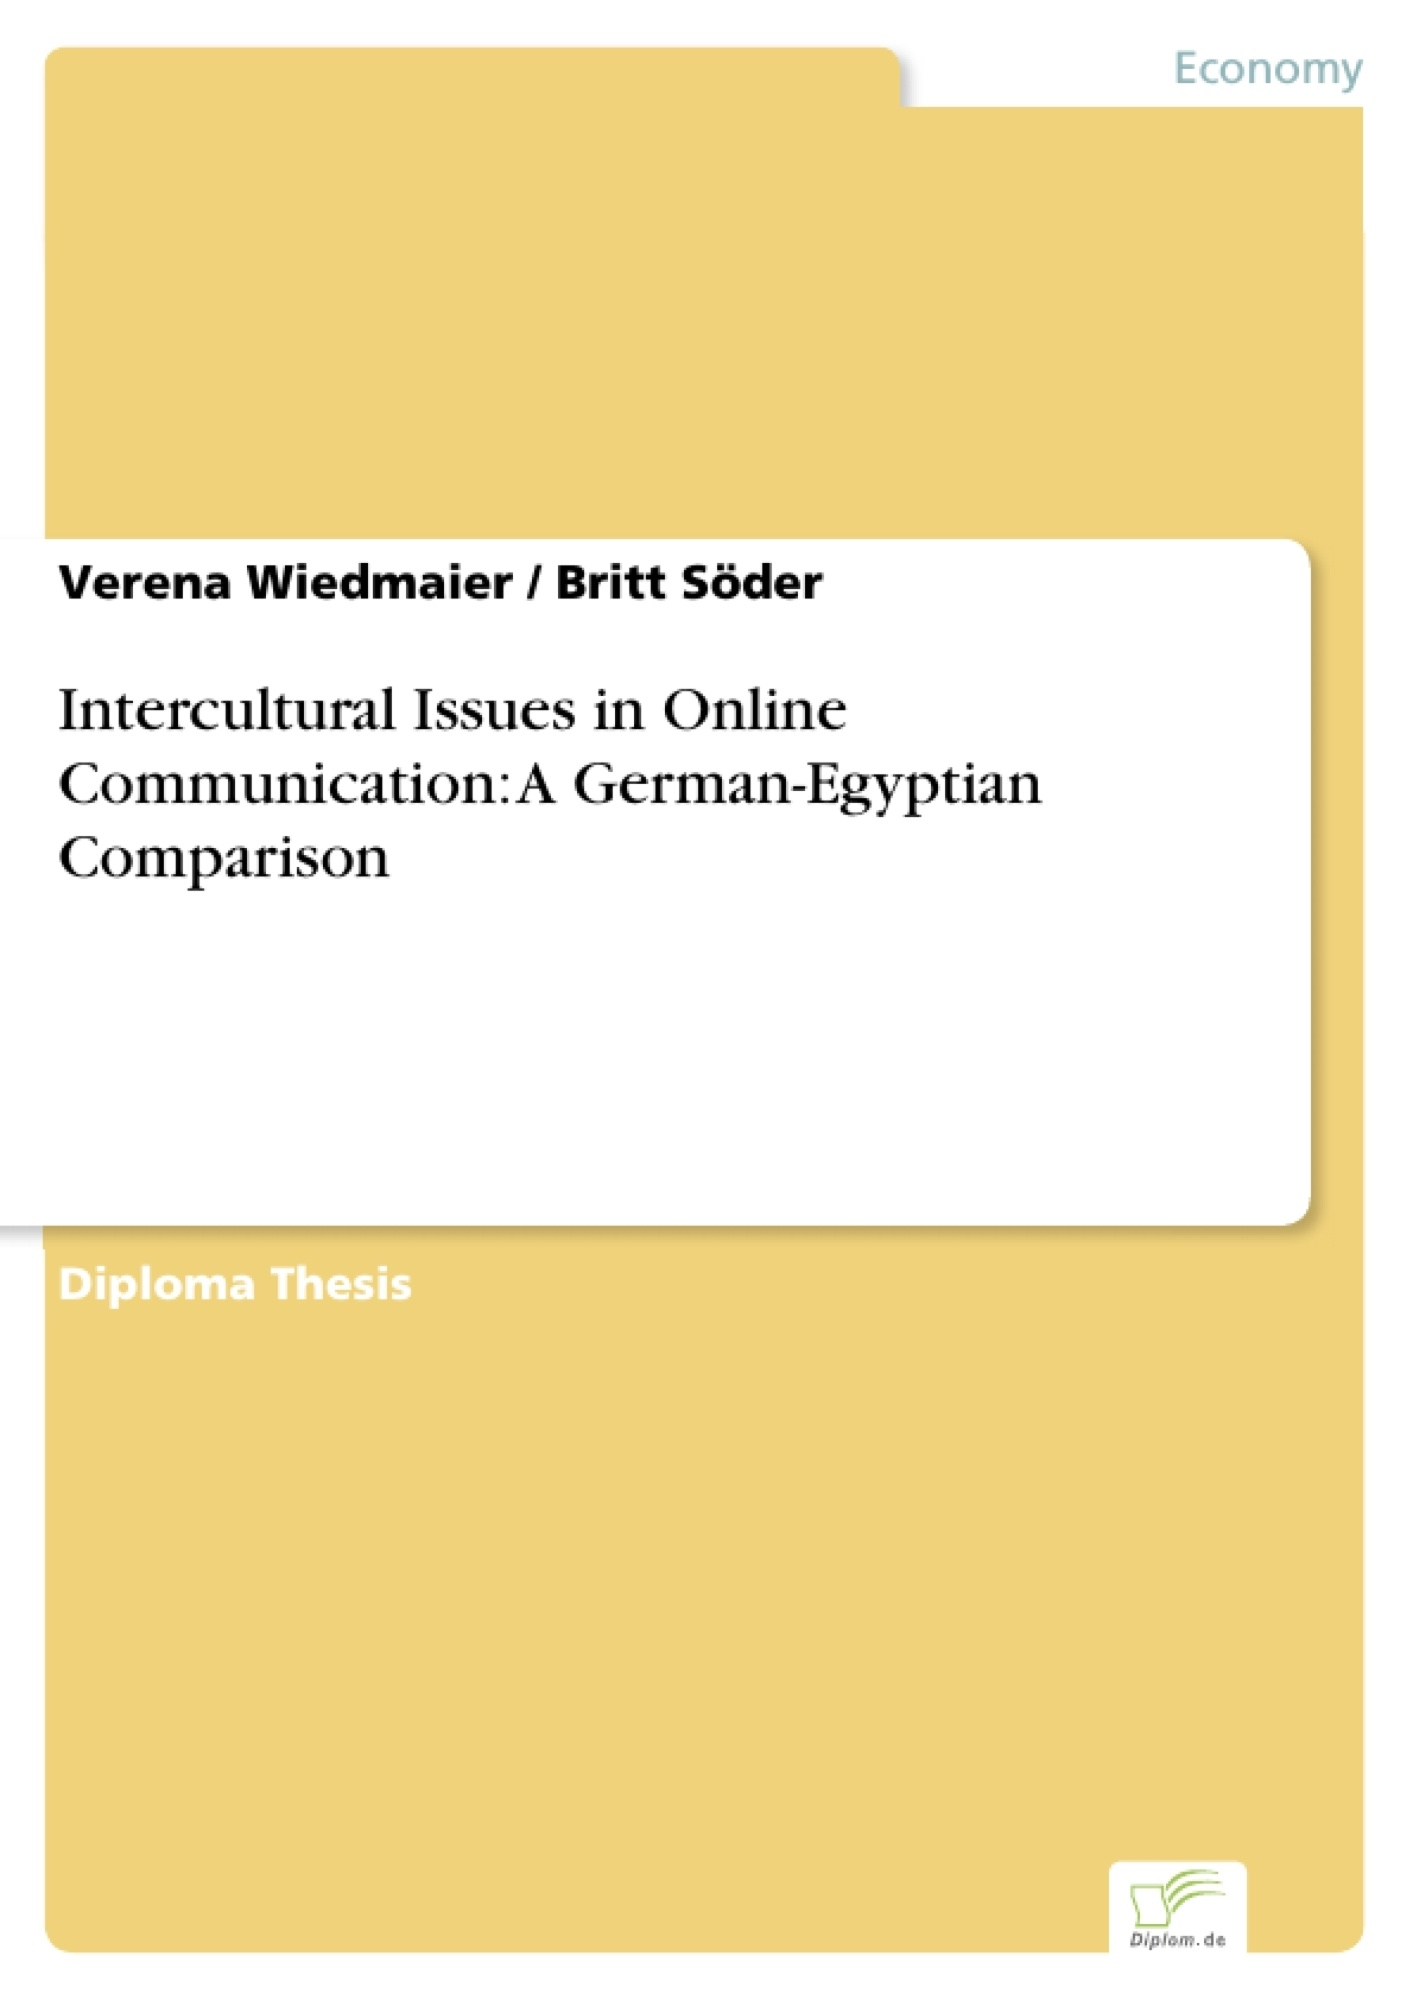 hs heilbronn bachelor thesis w2